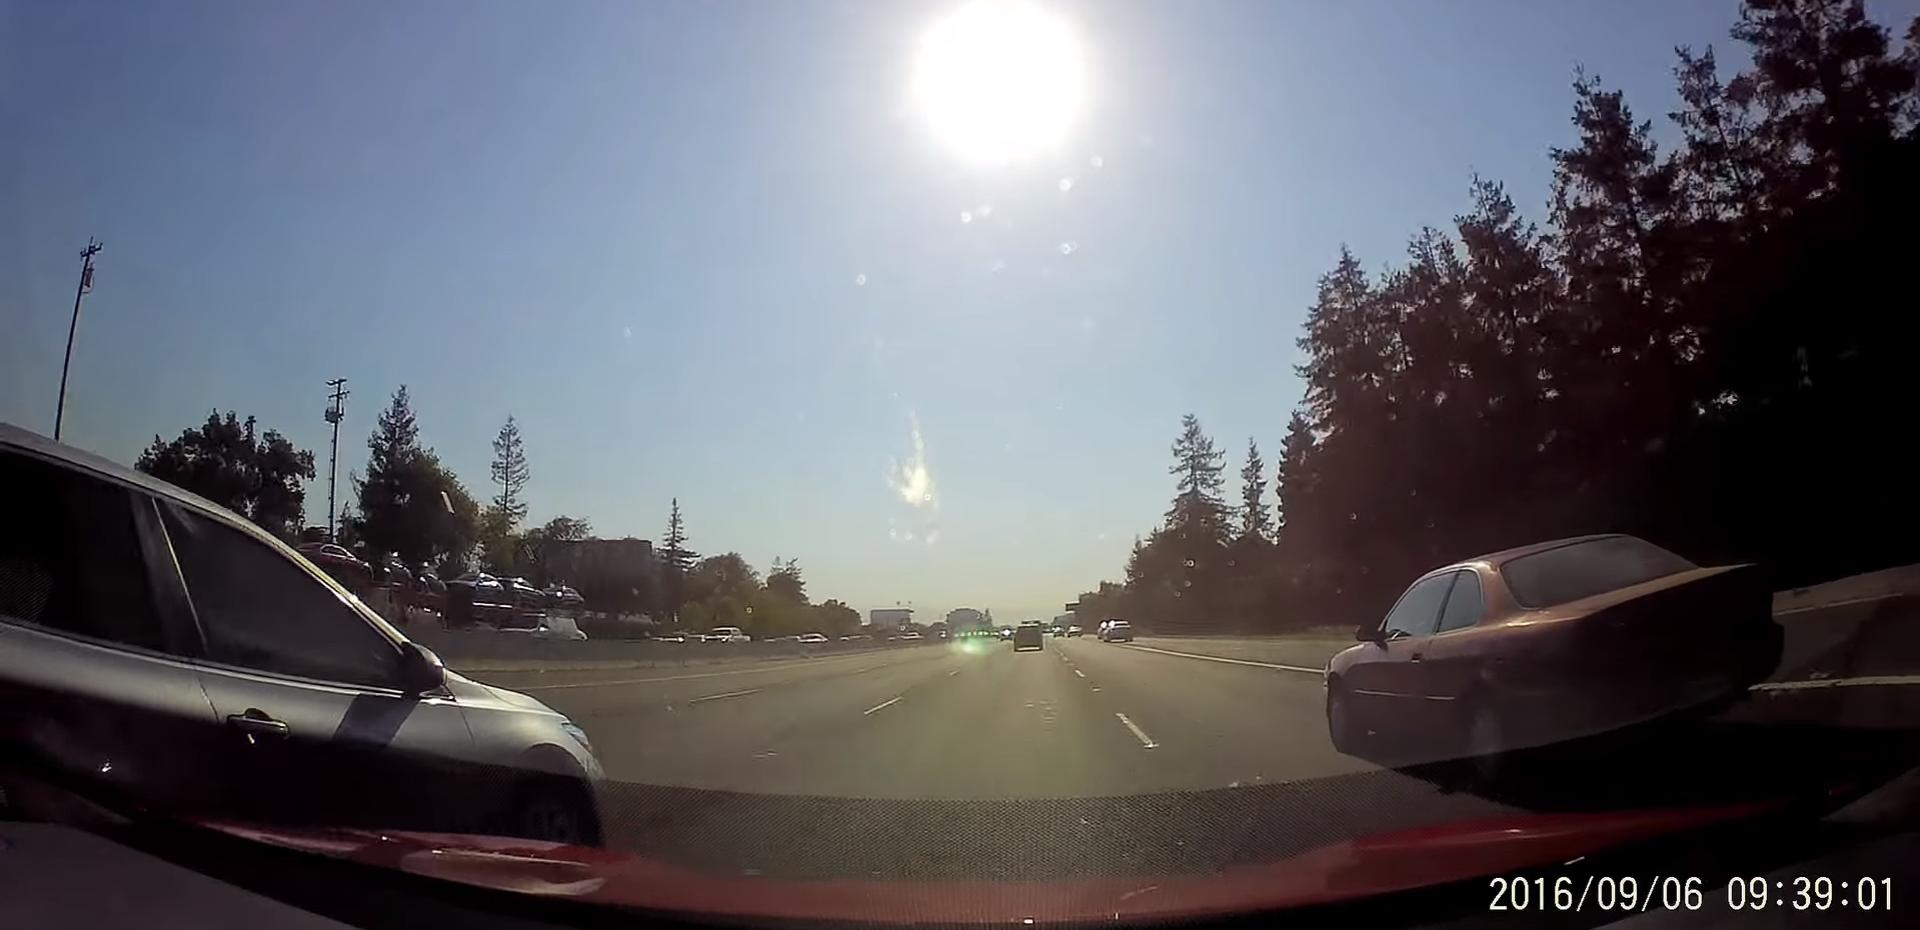 tesla-autopilot-avoids-collision-highway